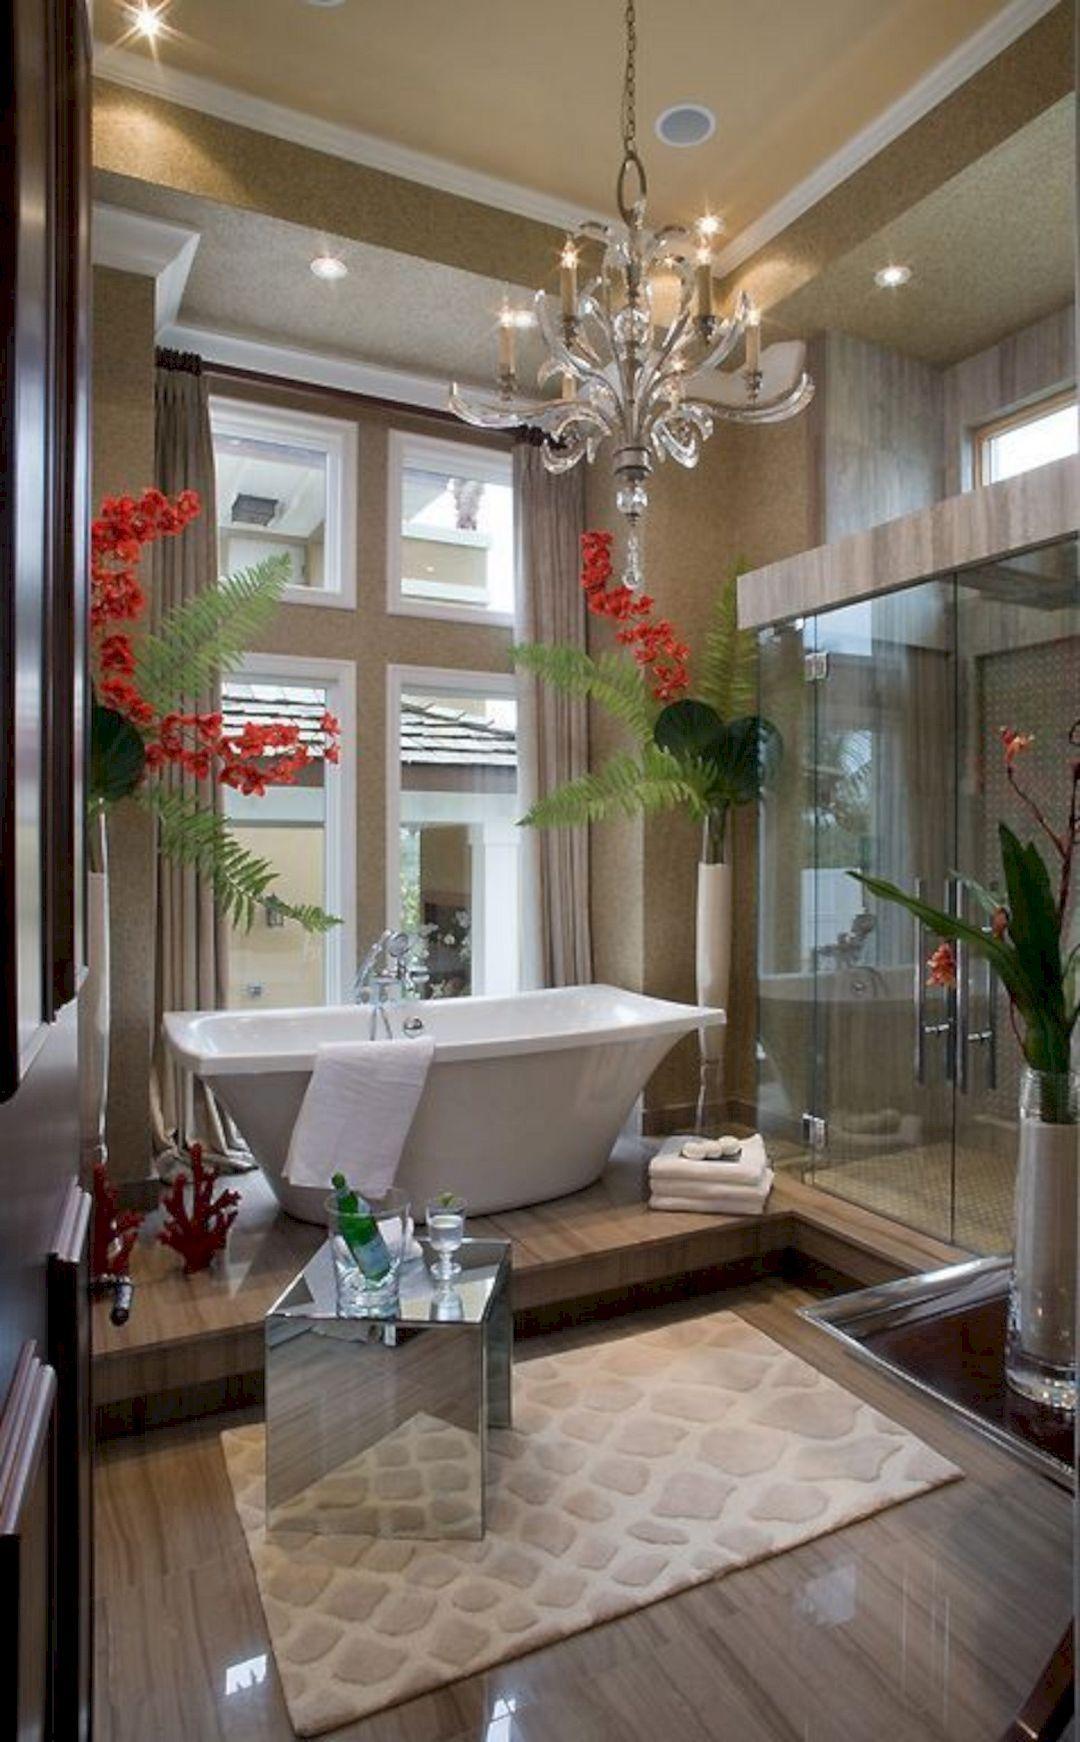 15 Elegant Bathroom Ideas to Steal   Beautiful bathrooms ...